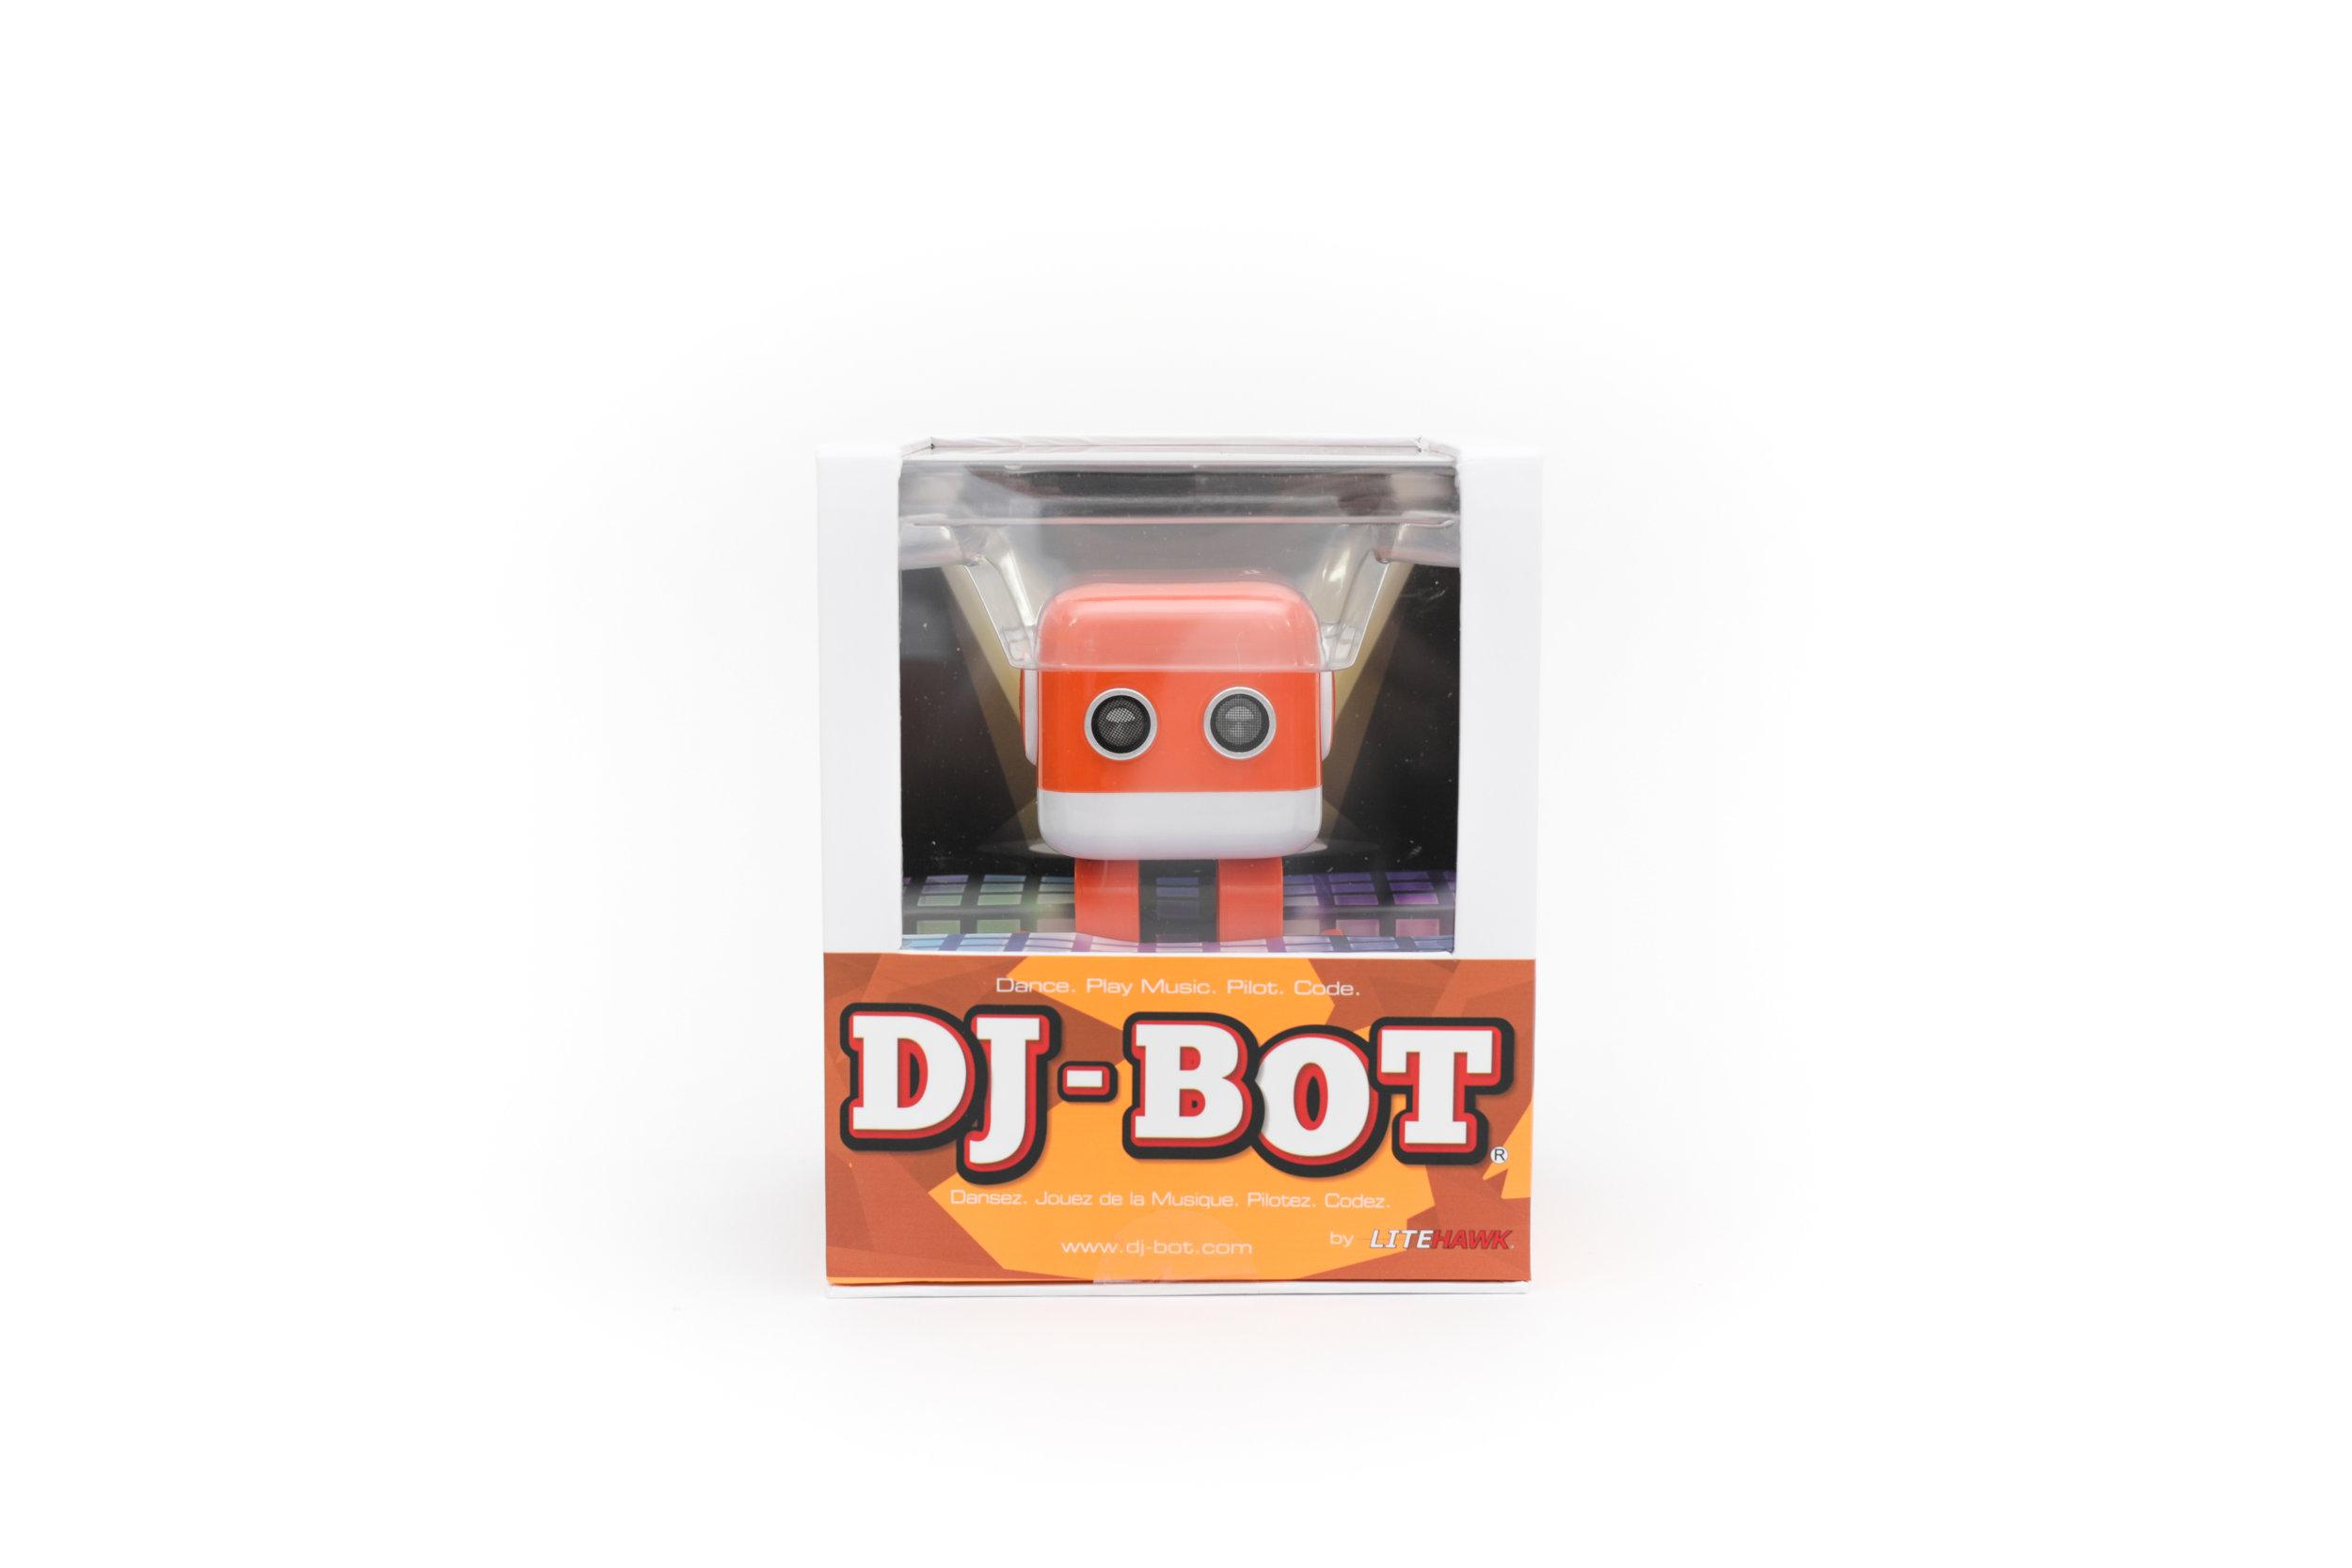 DJ BOT Box (1 of 6).jpg